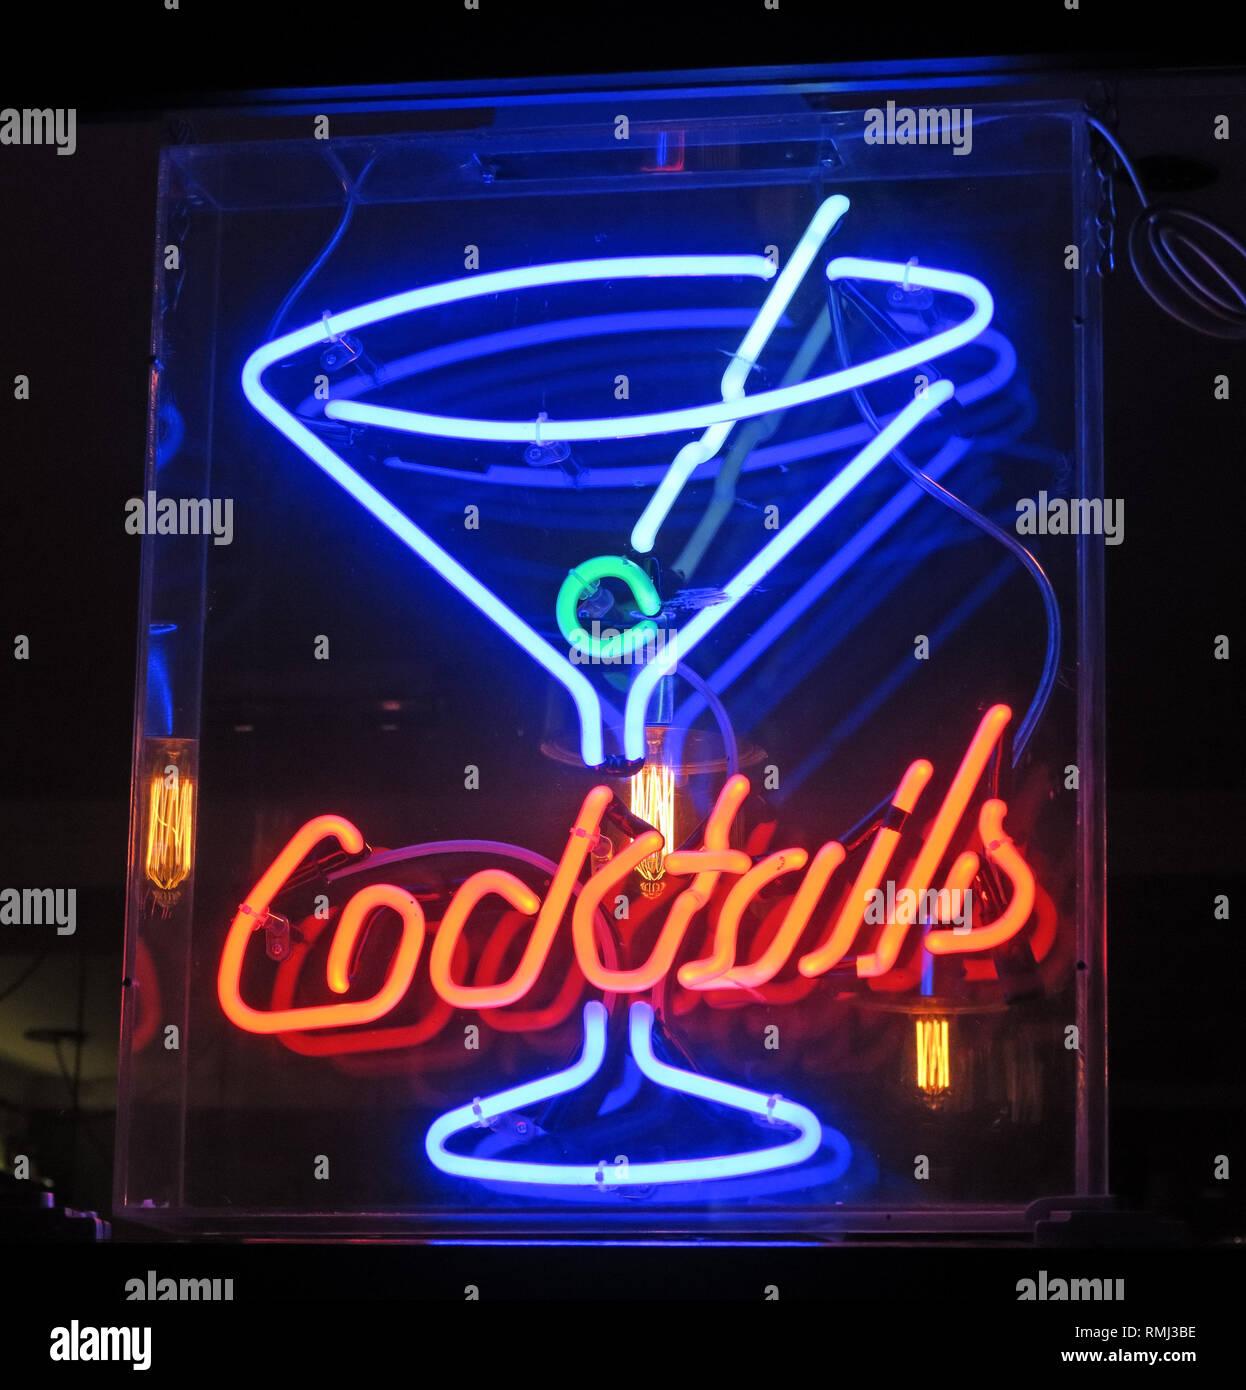 @HotpixUK,HotpixUK,GoTonySmith,England,UK,Neon,lights,night,dusk,neon lights,sign,advert,advertising,bright,lighting,London,SoHo,South East England,City Centre,City,tourist,tourism,travel,neon sign,neon signs,evening,night time,band member,music,cocktail,neon,bar,Cocktail bar,pub,drink,alcoholic drink,alcohol,spirits,popular,mocktails